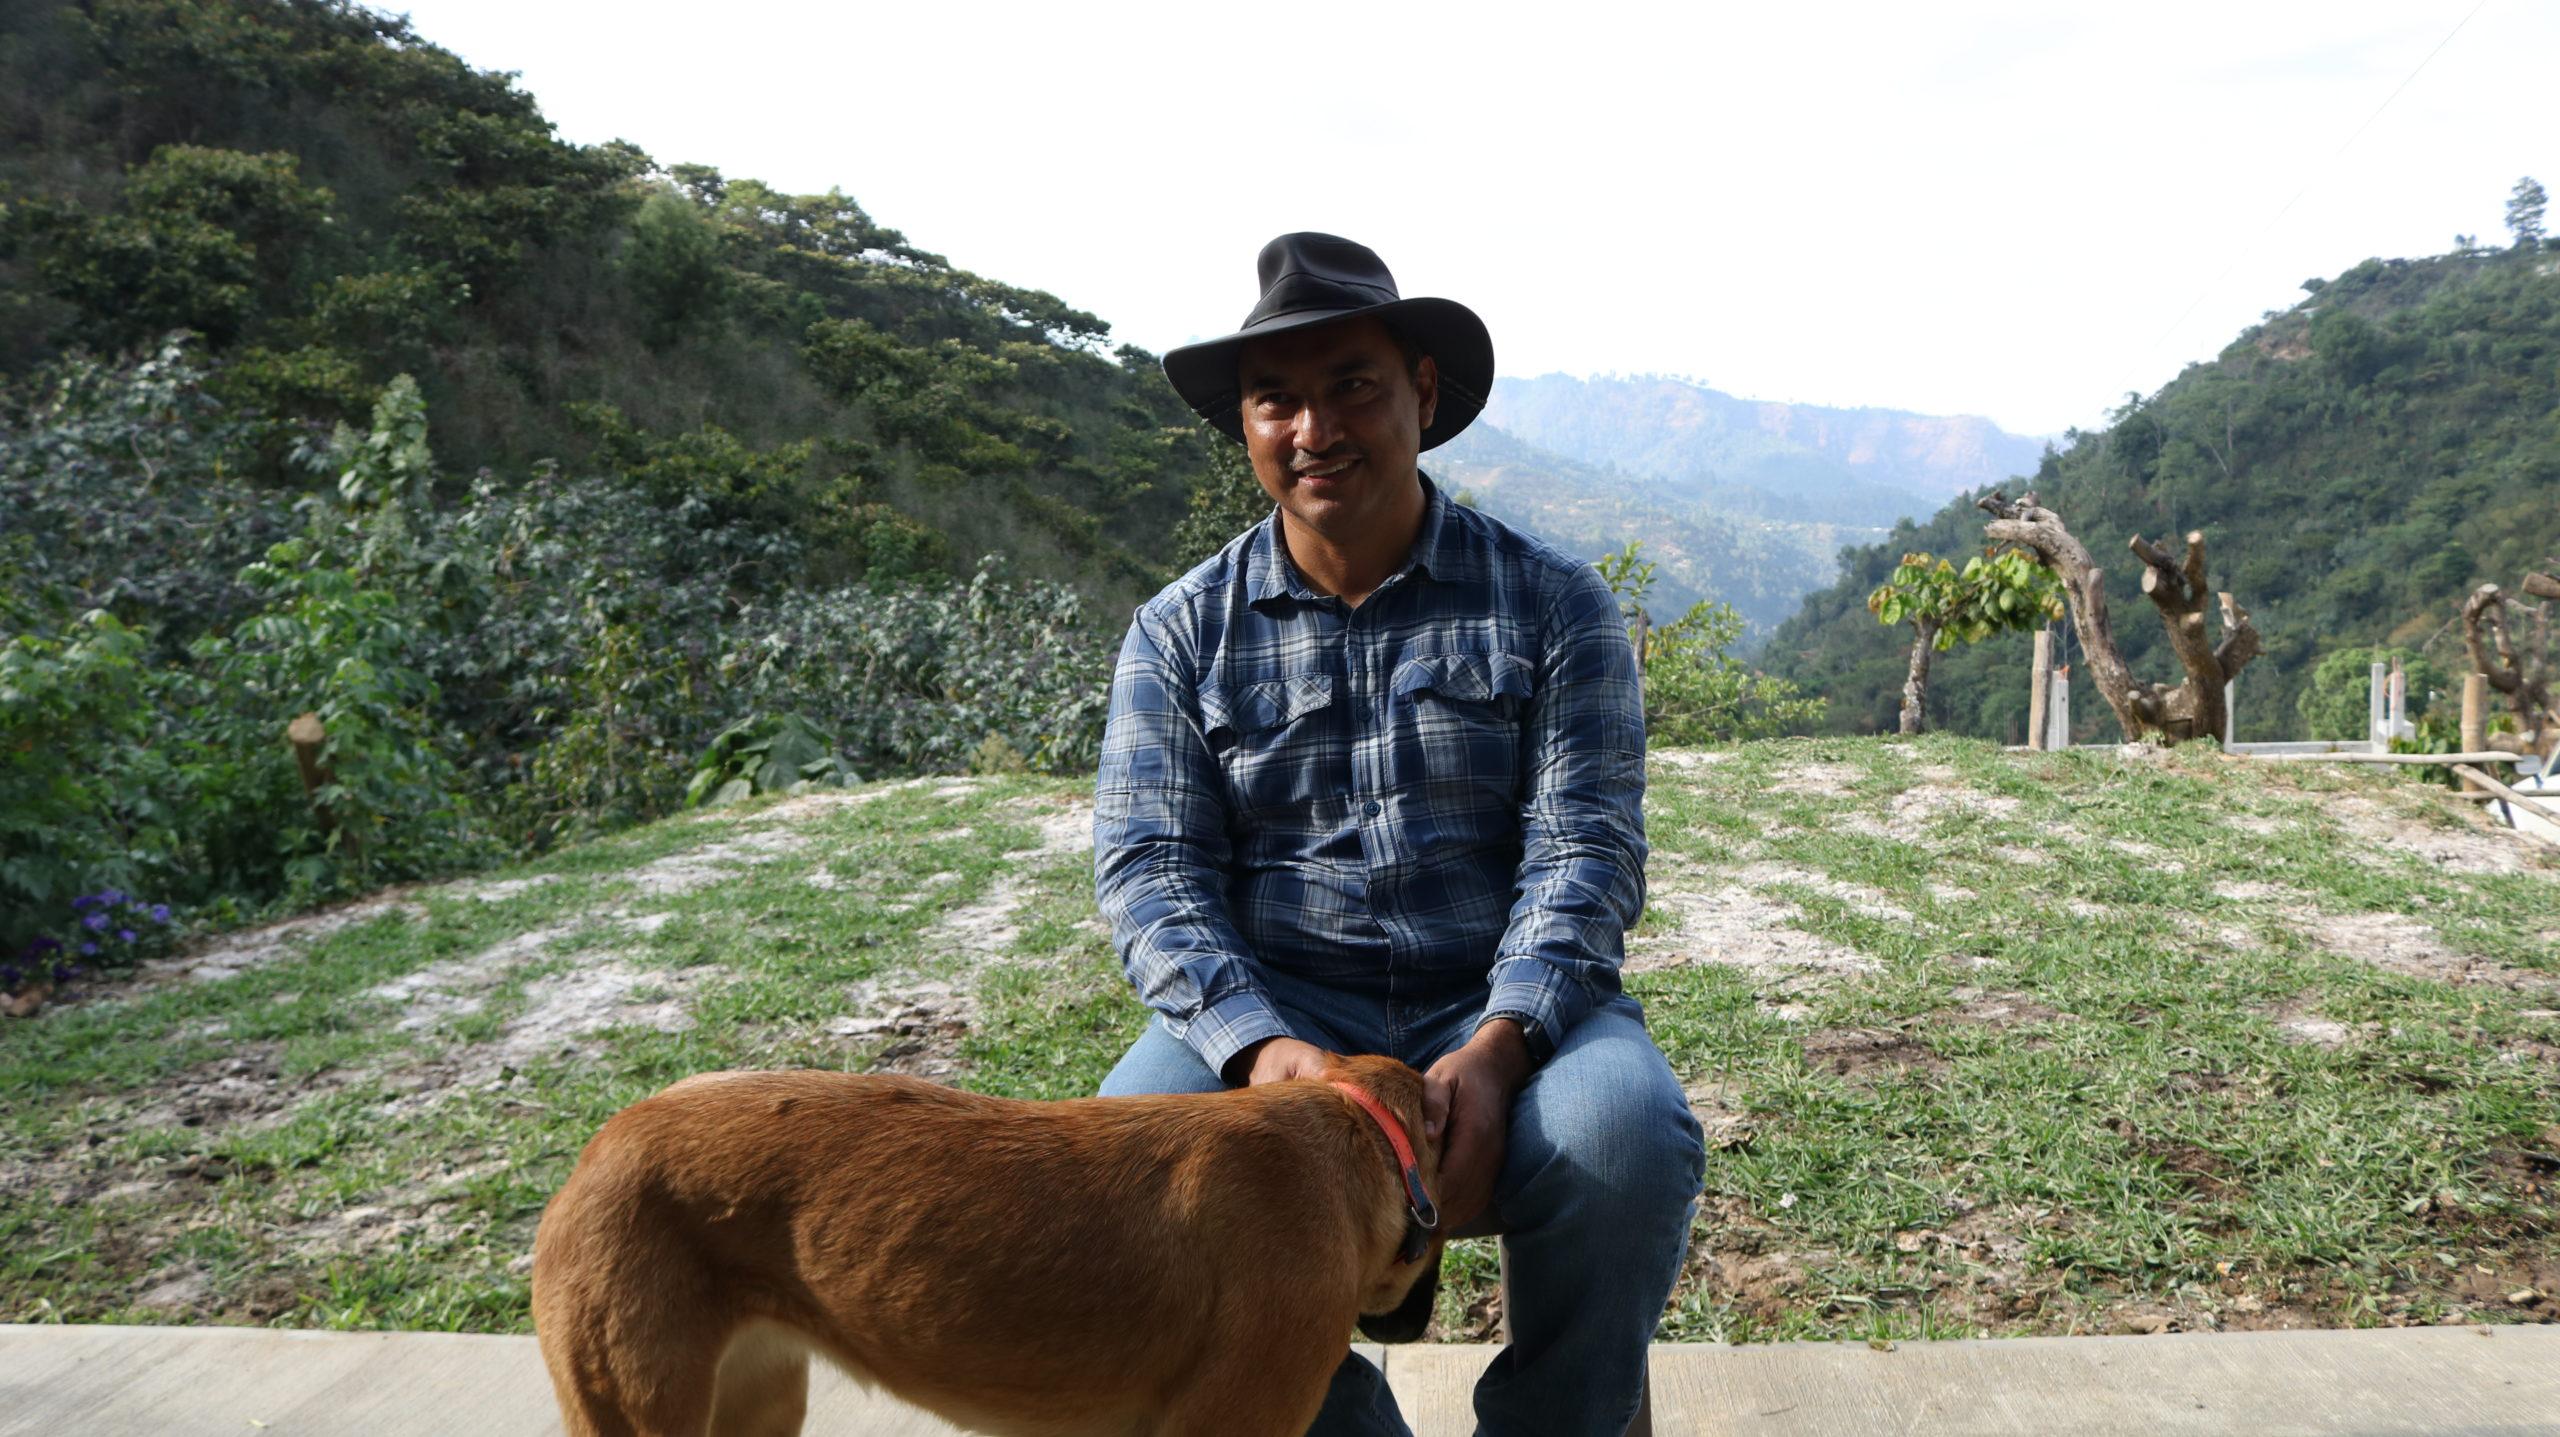 Guatemala - Ferme El Templo